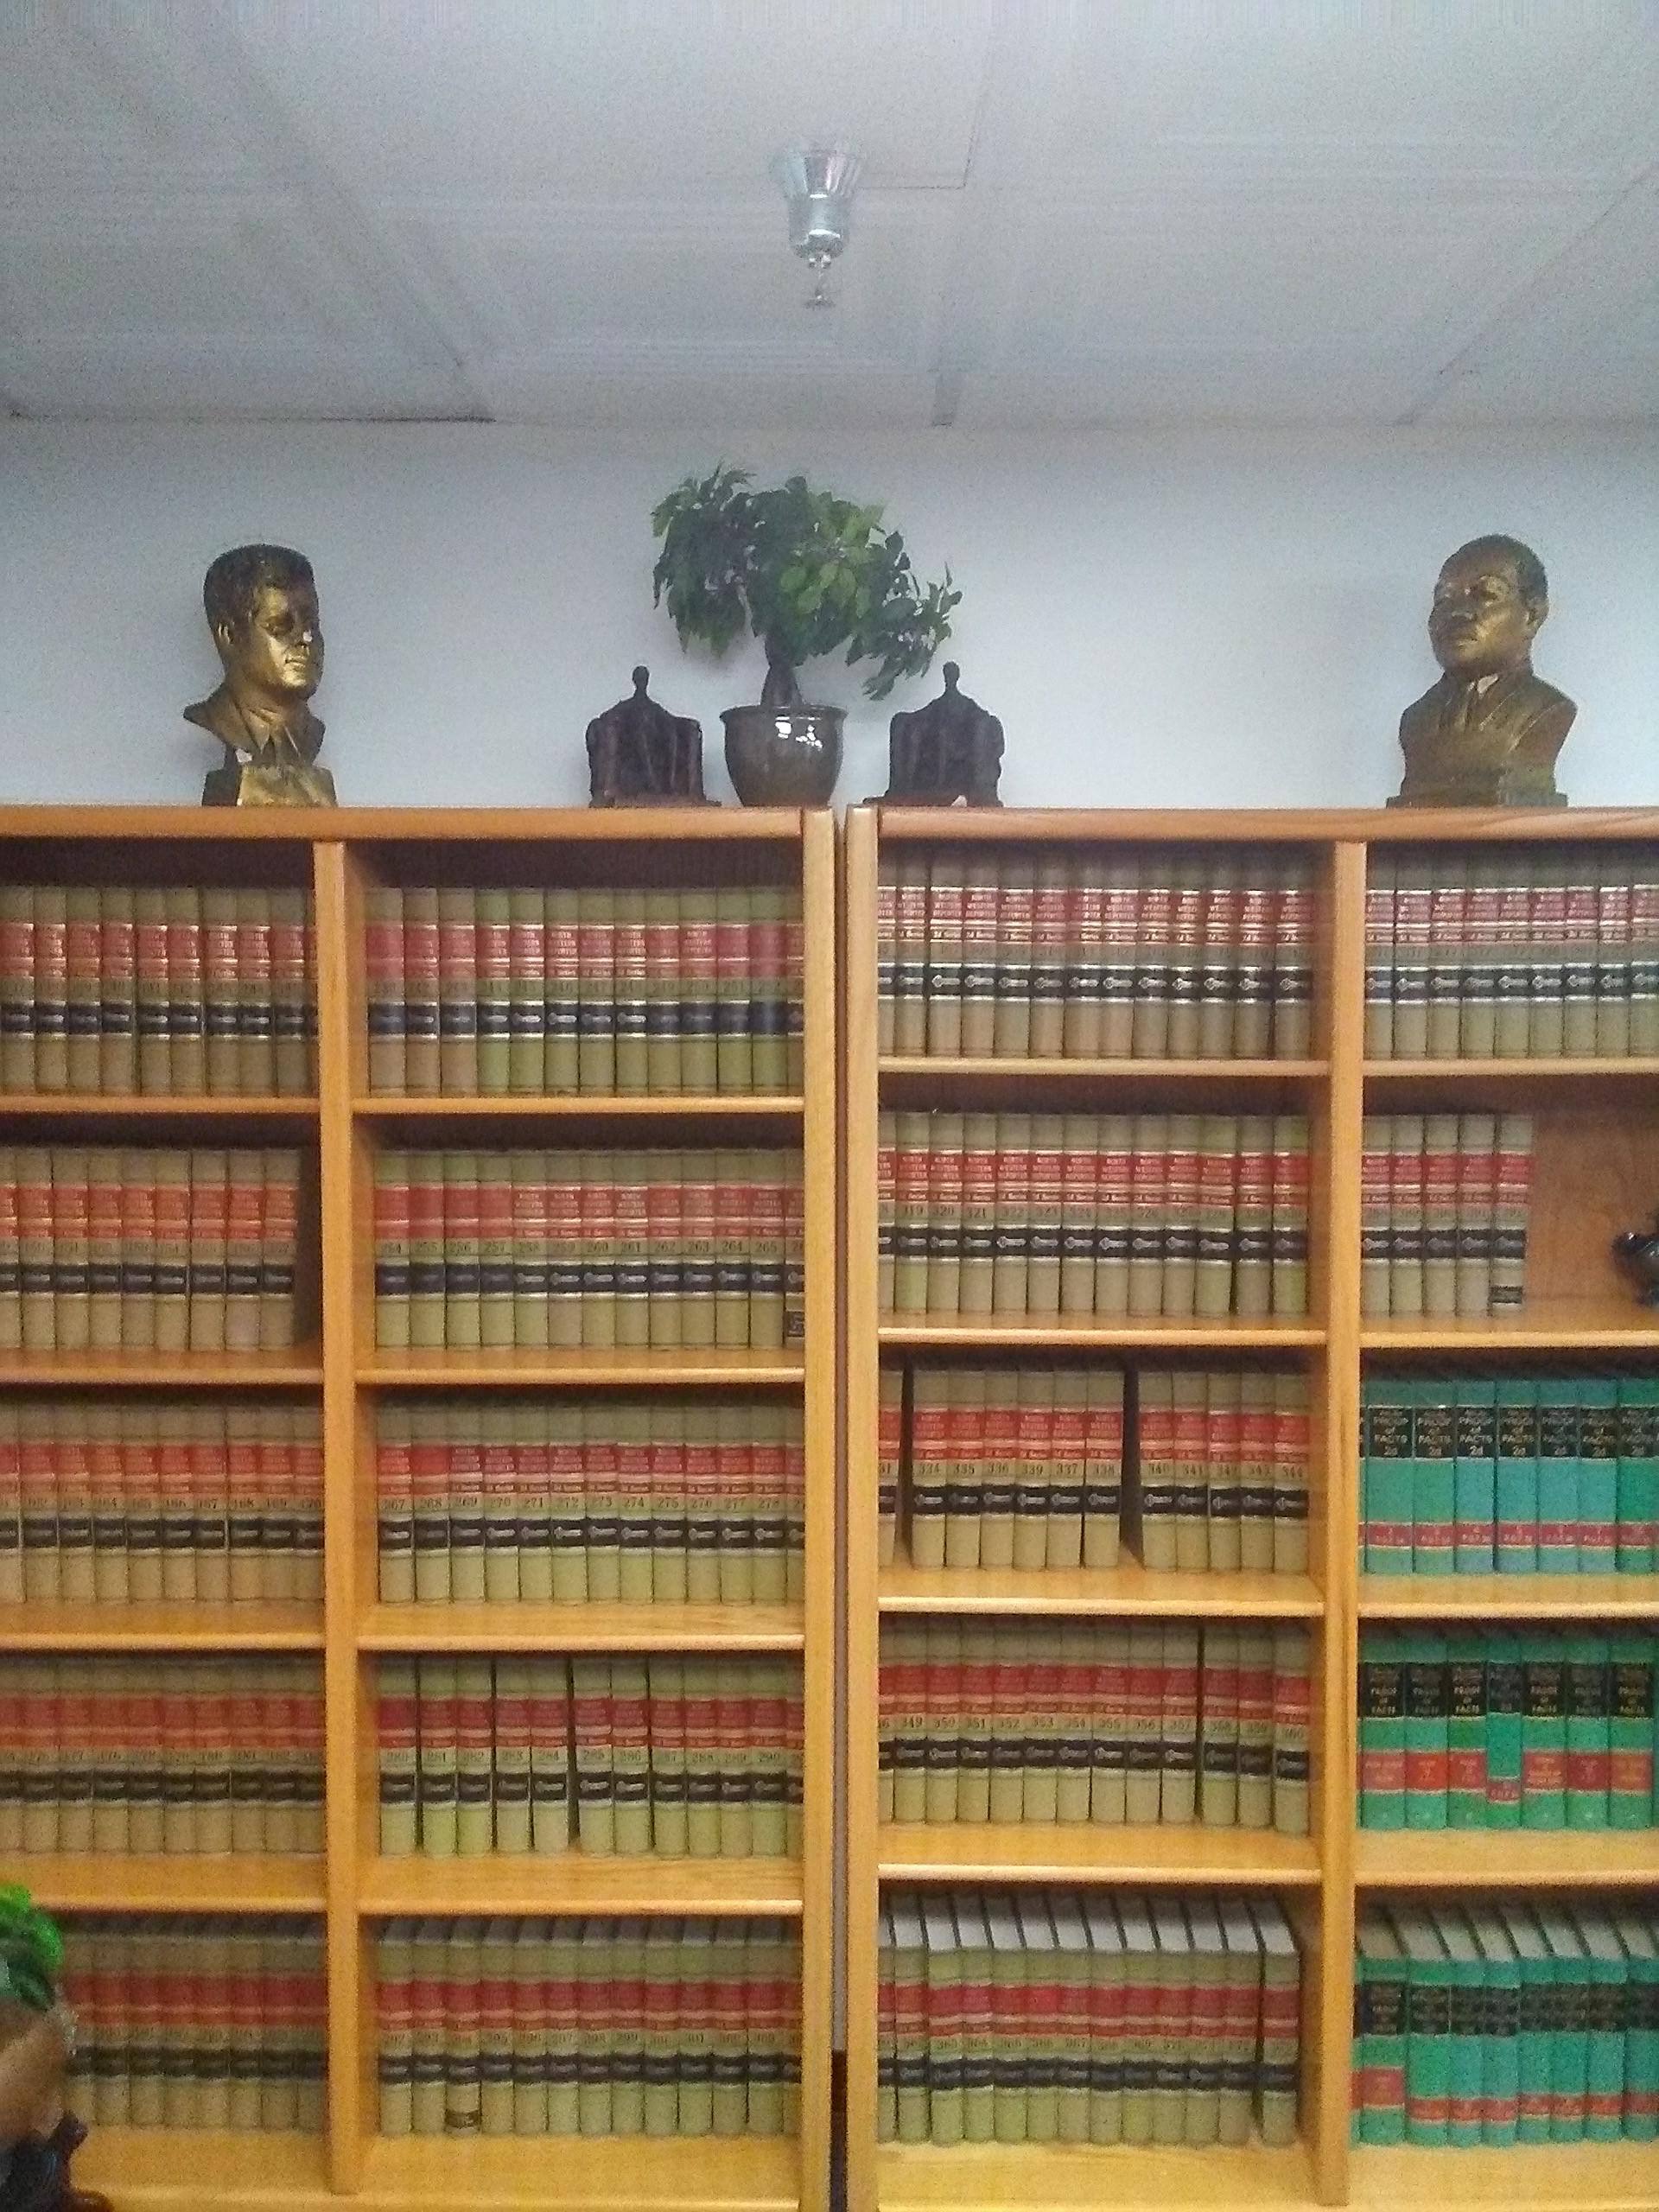 5th Judicial District Community Service